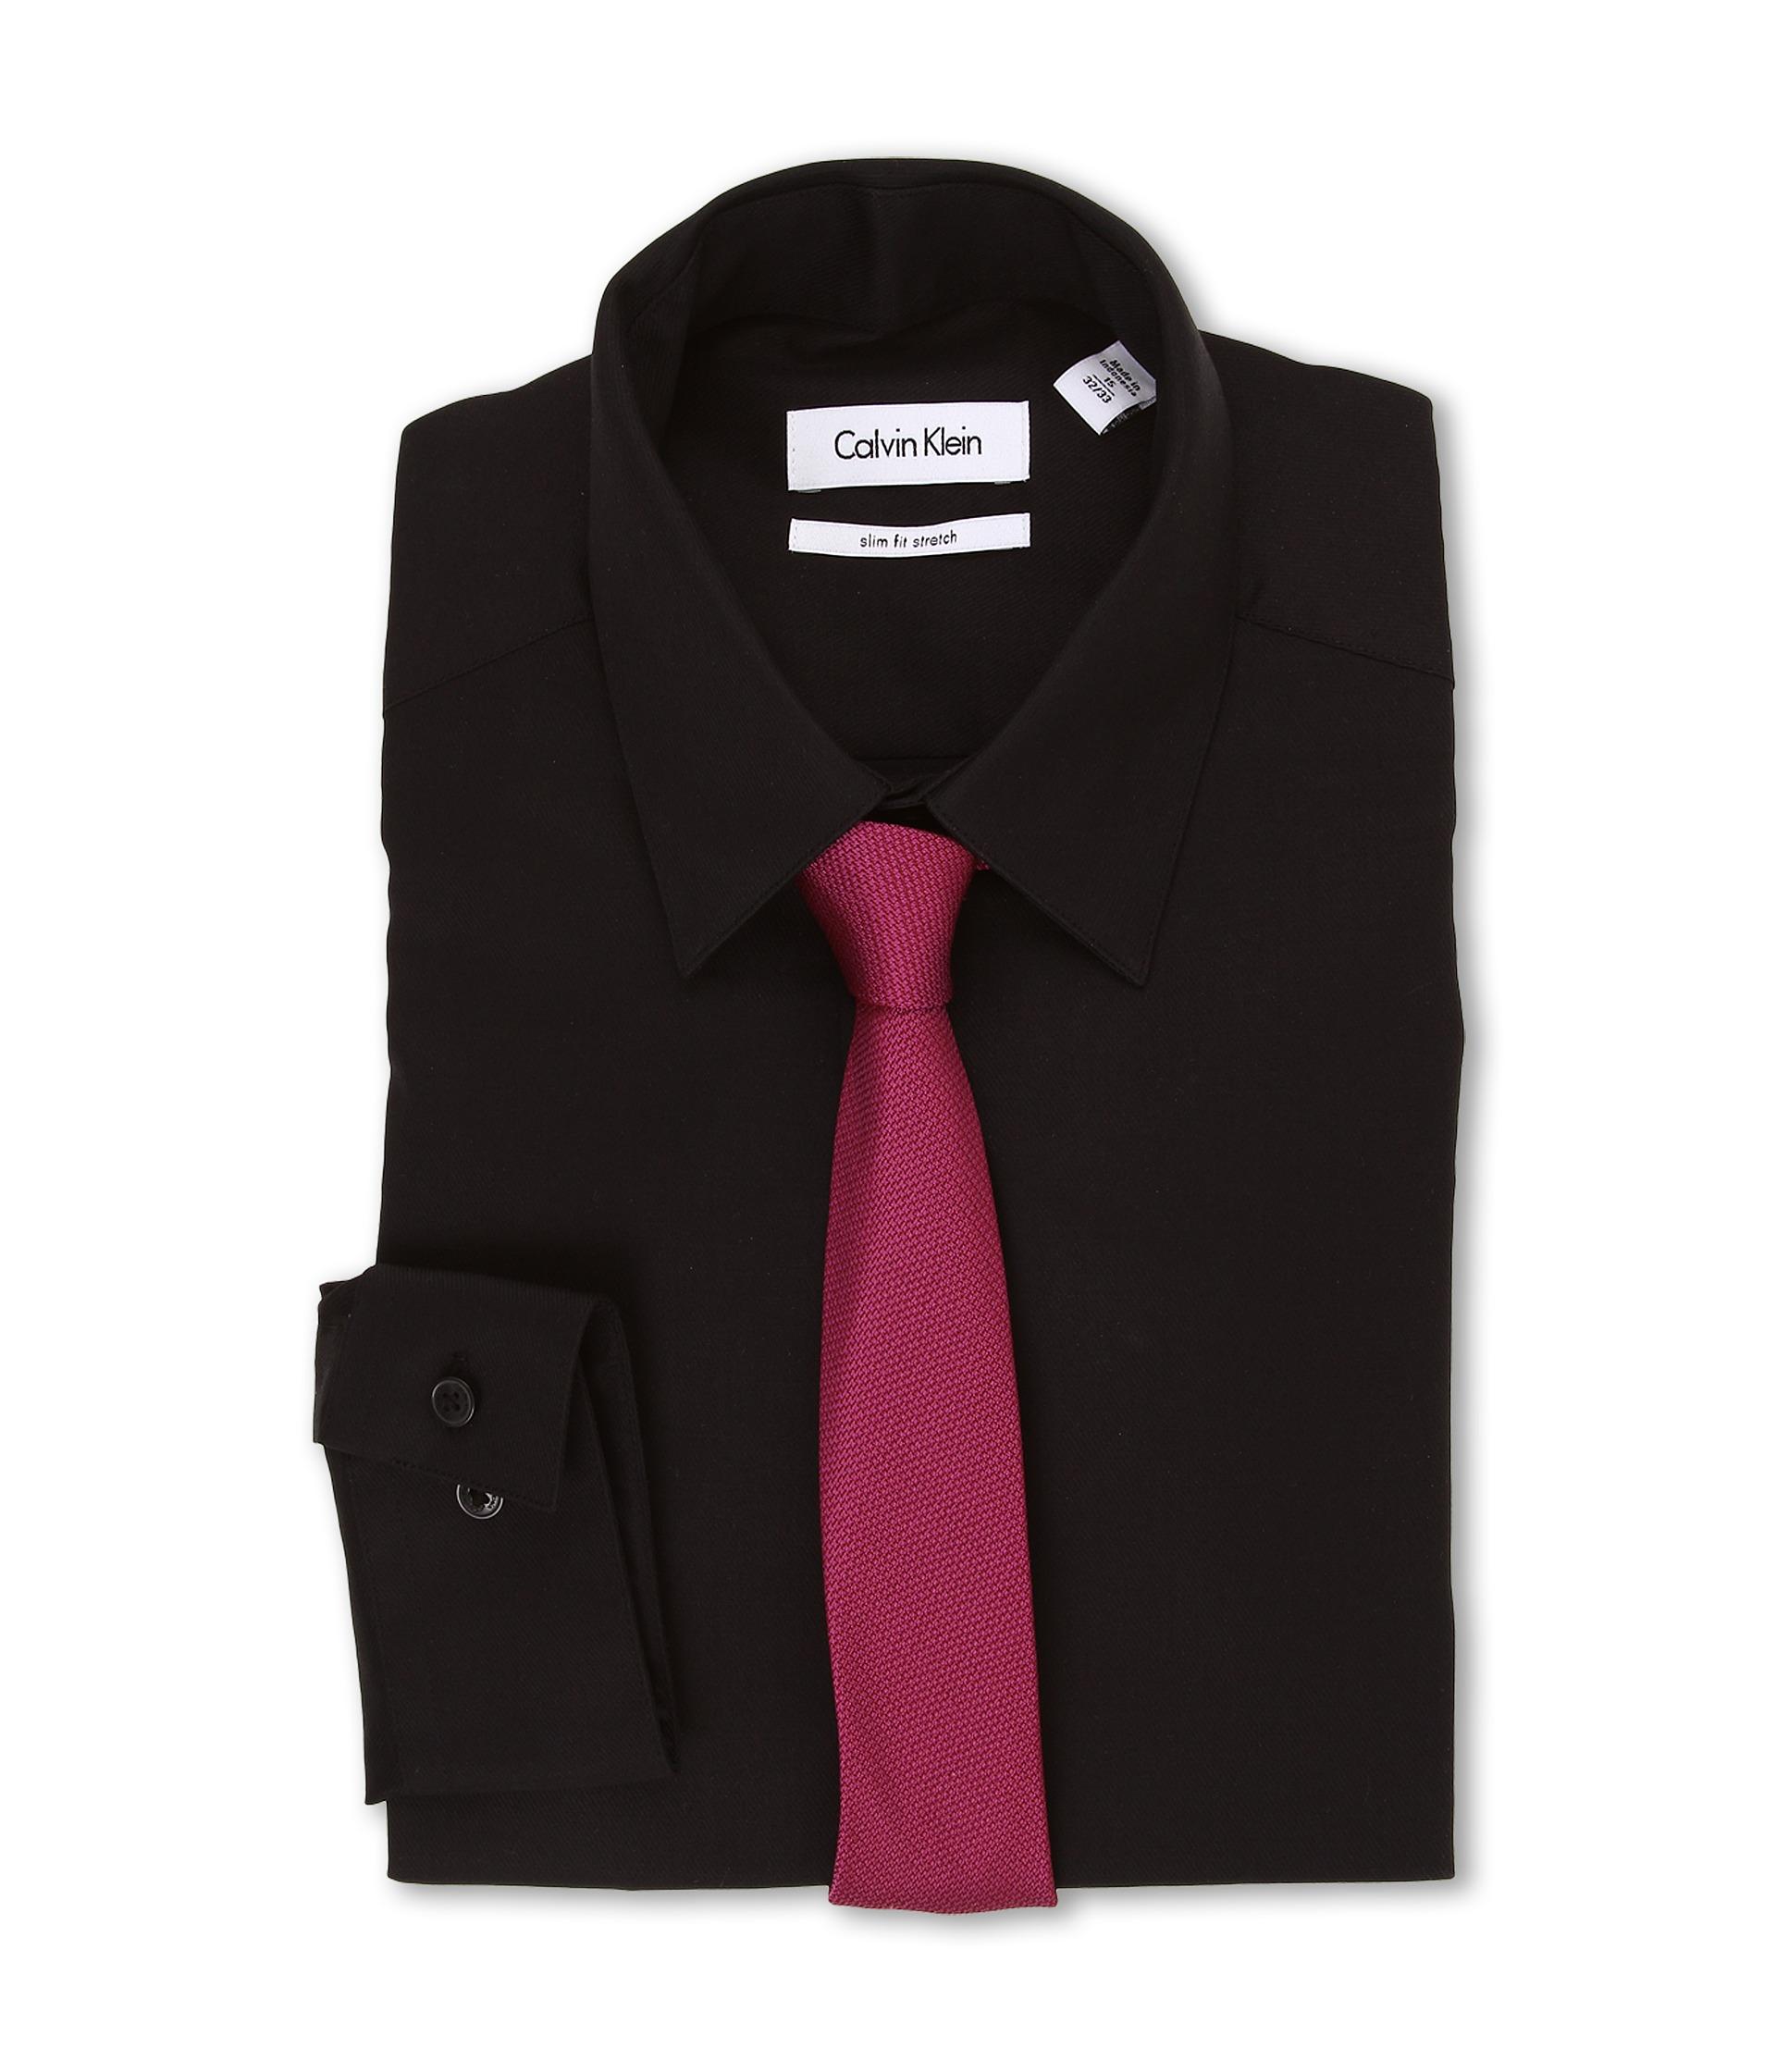 Calvin klein slim fit stretch solid l s point dress shirt for Calvin klein slim fit stretch shirt